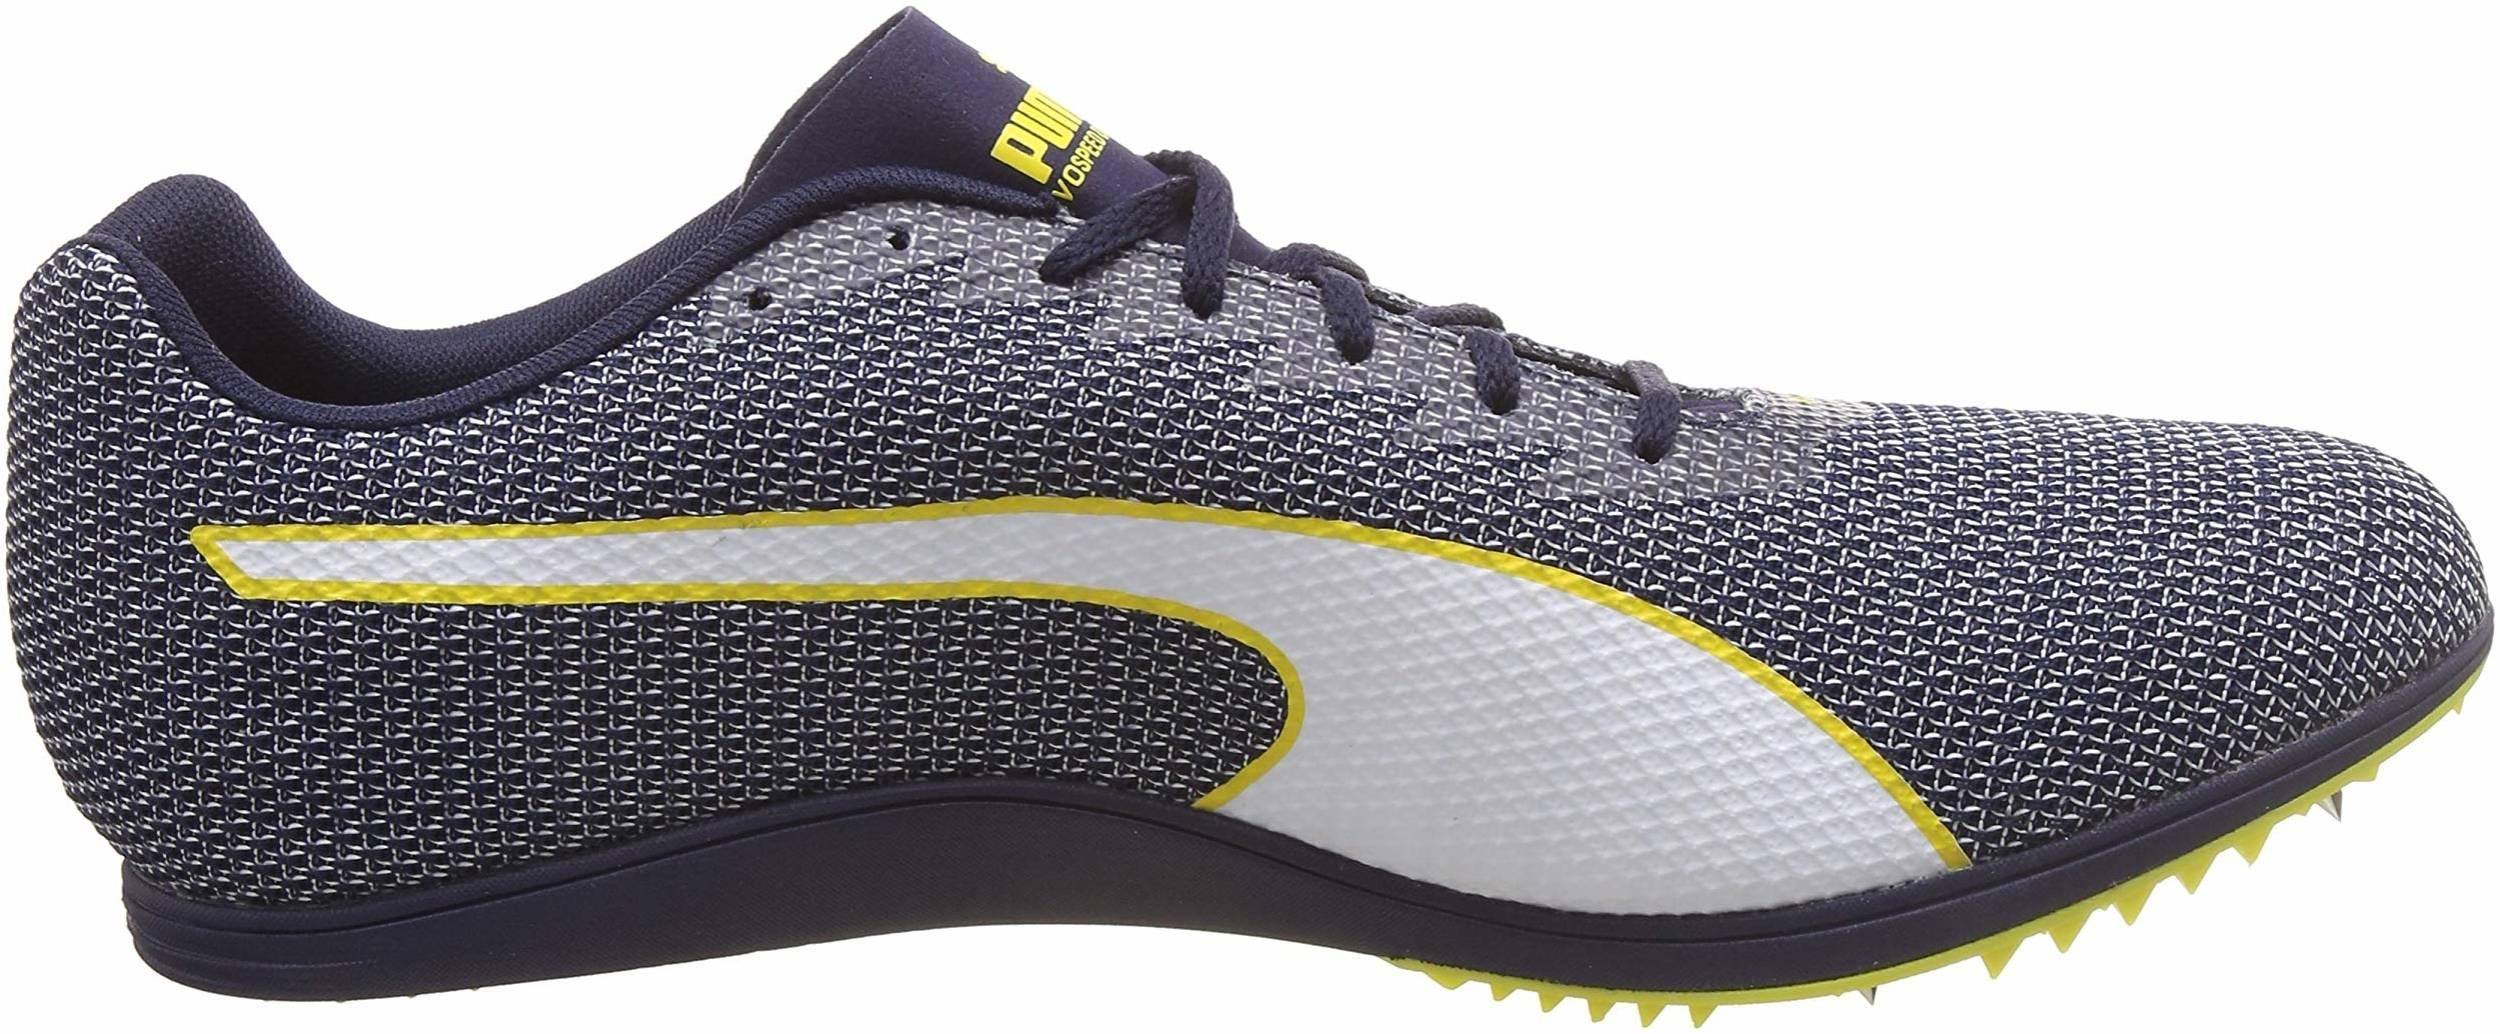 10 Puma track & Field shoes - Save 65% | RunRepeat